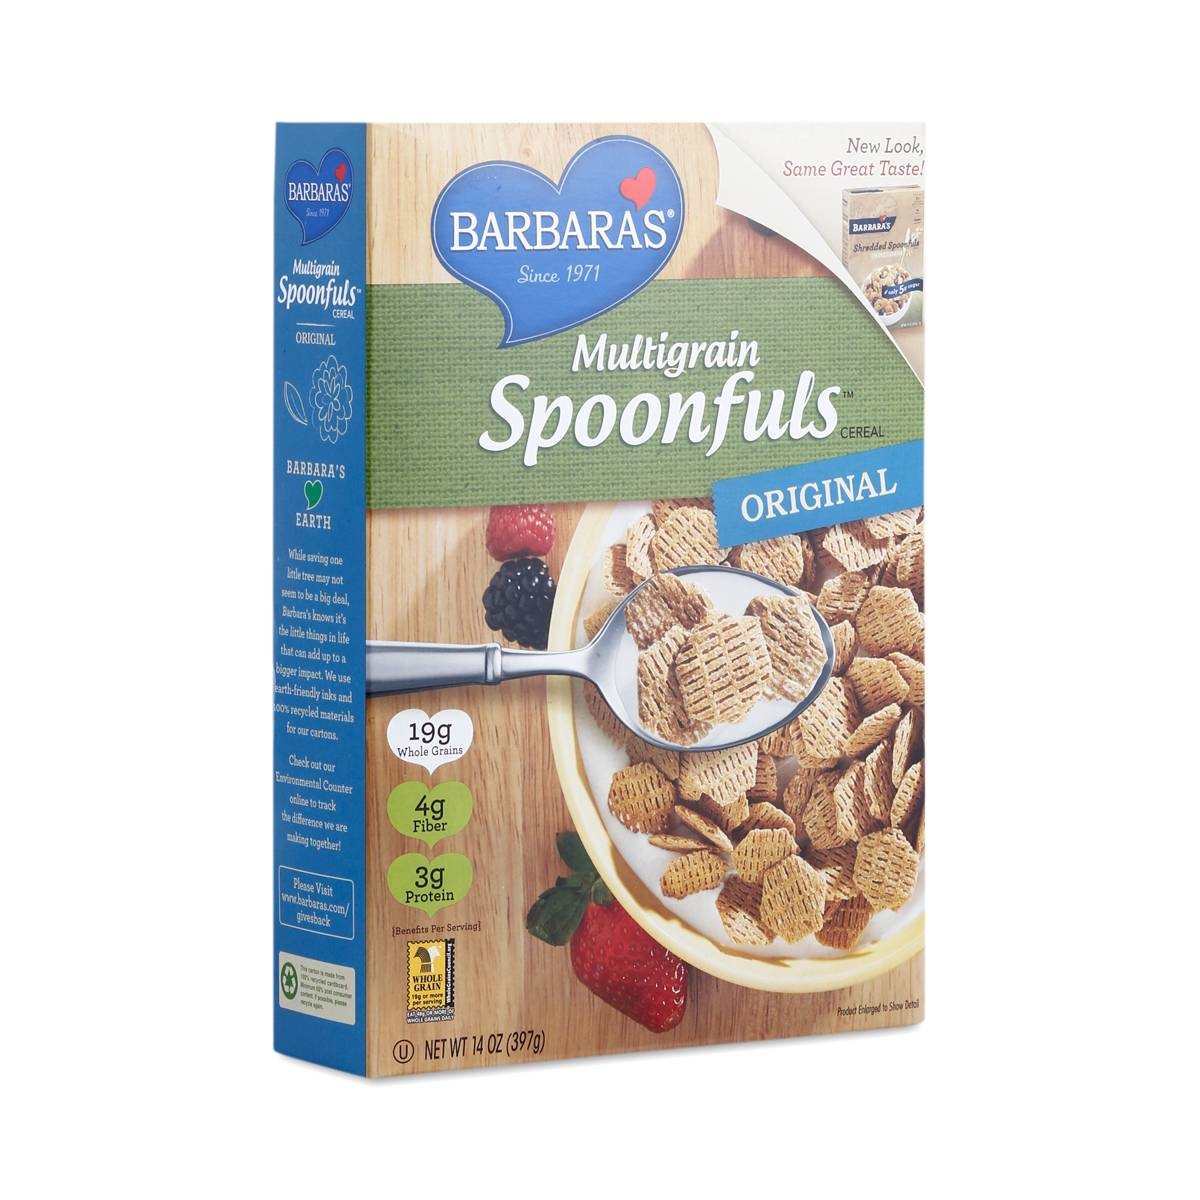 Multigrain Spoonfuls Cereal By Barbara's Bakery